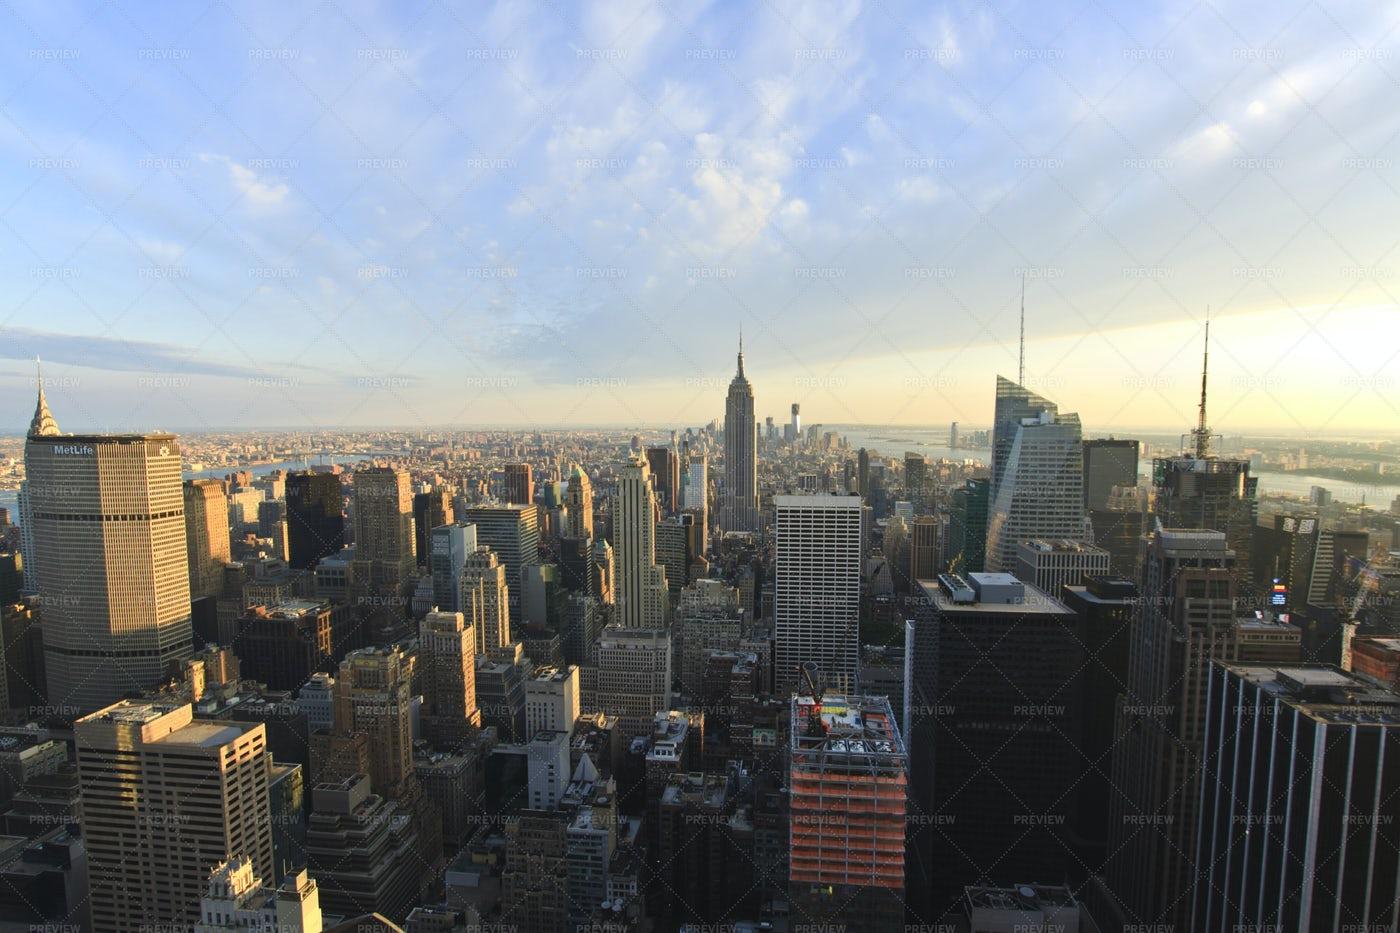 Panorama View Of New York City: Stock Photos